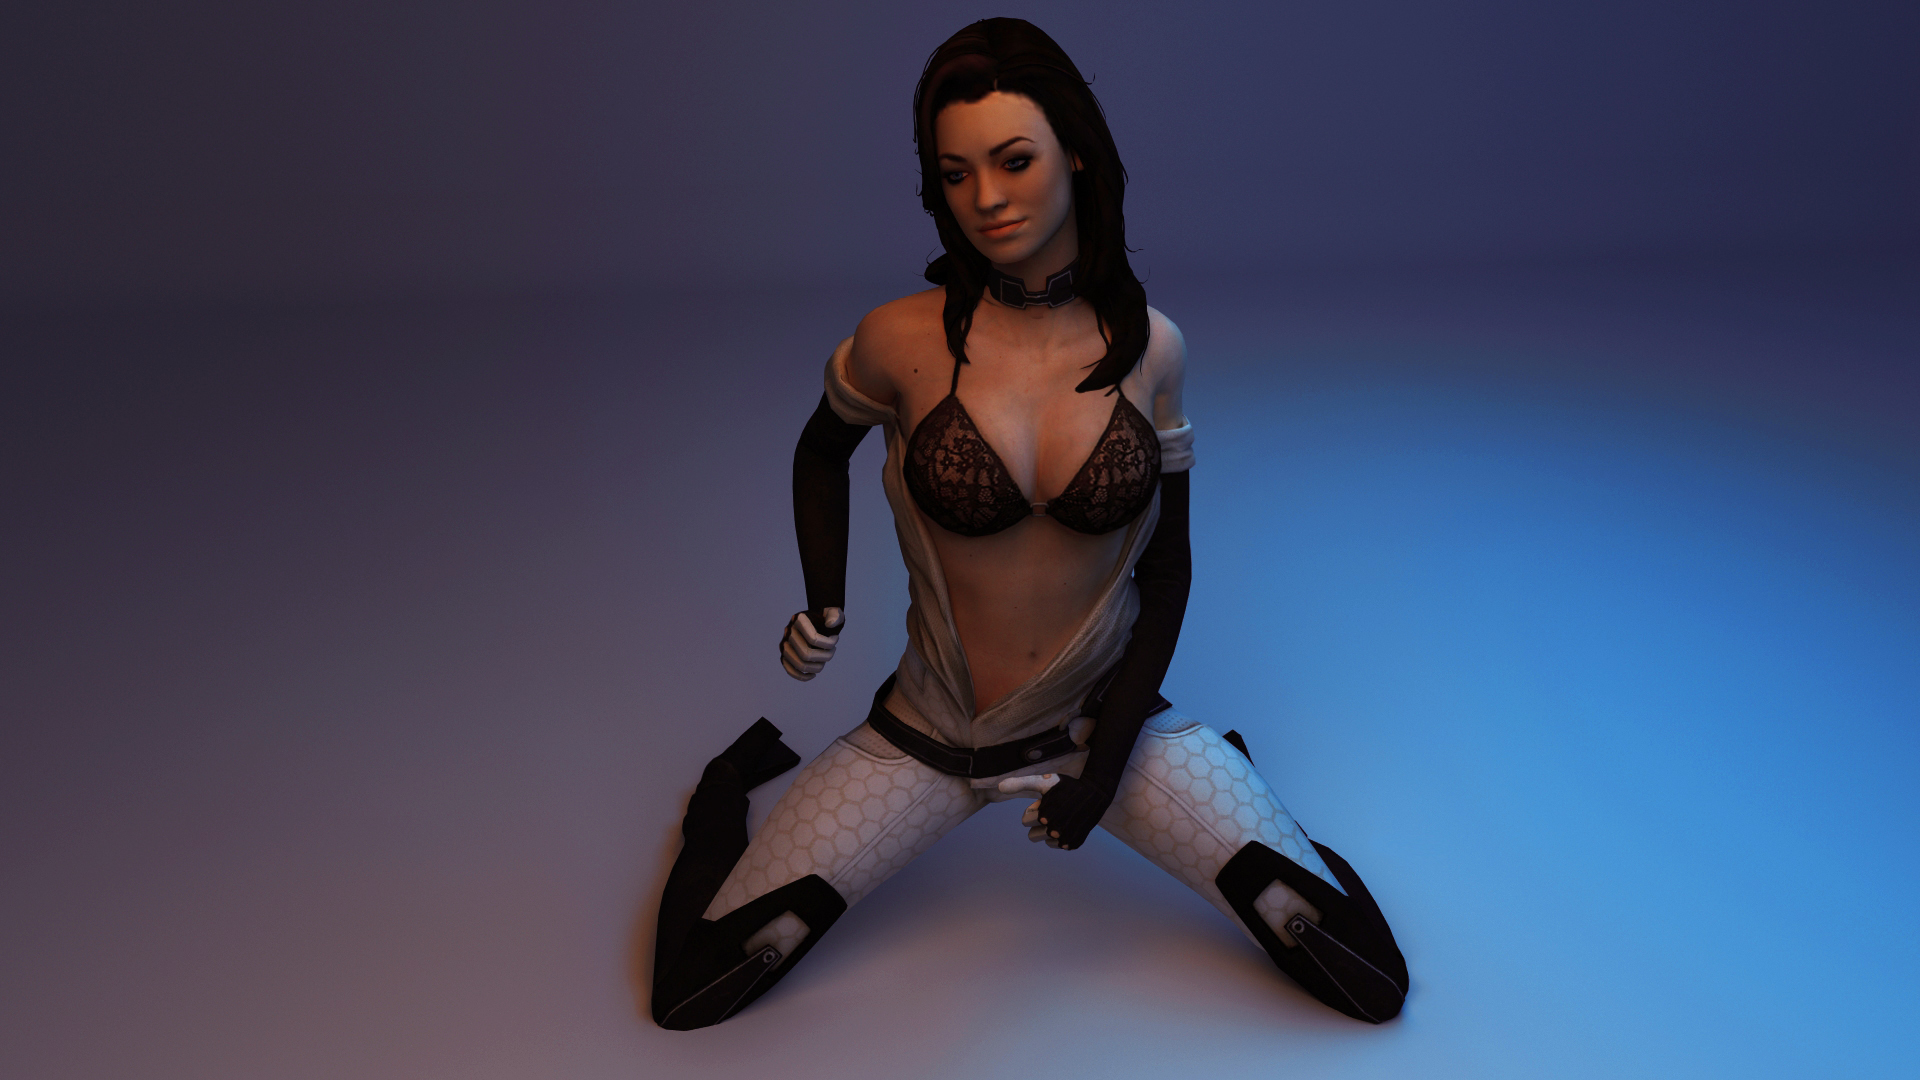 image Mass effect futa on female